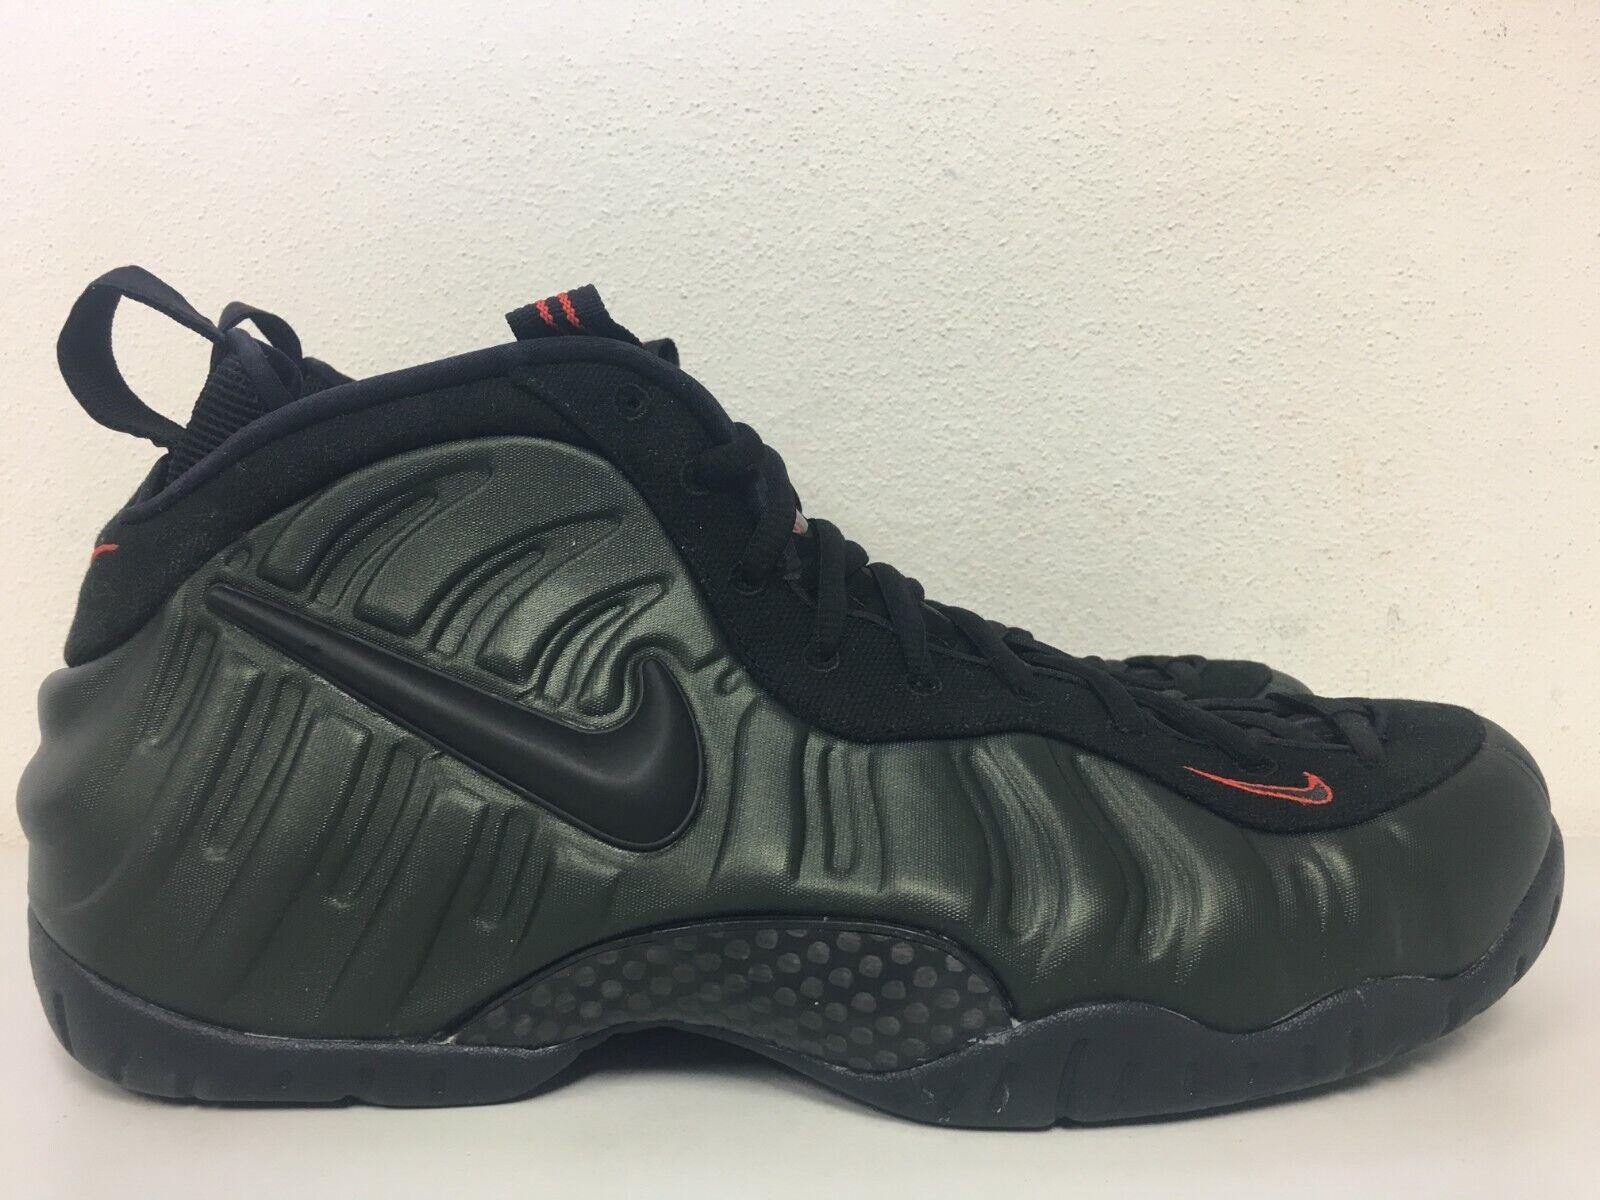 Nike Air Foamposite Pro Sequoia Black Team orange 624041-304 Mens Size 12